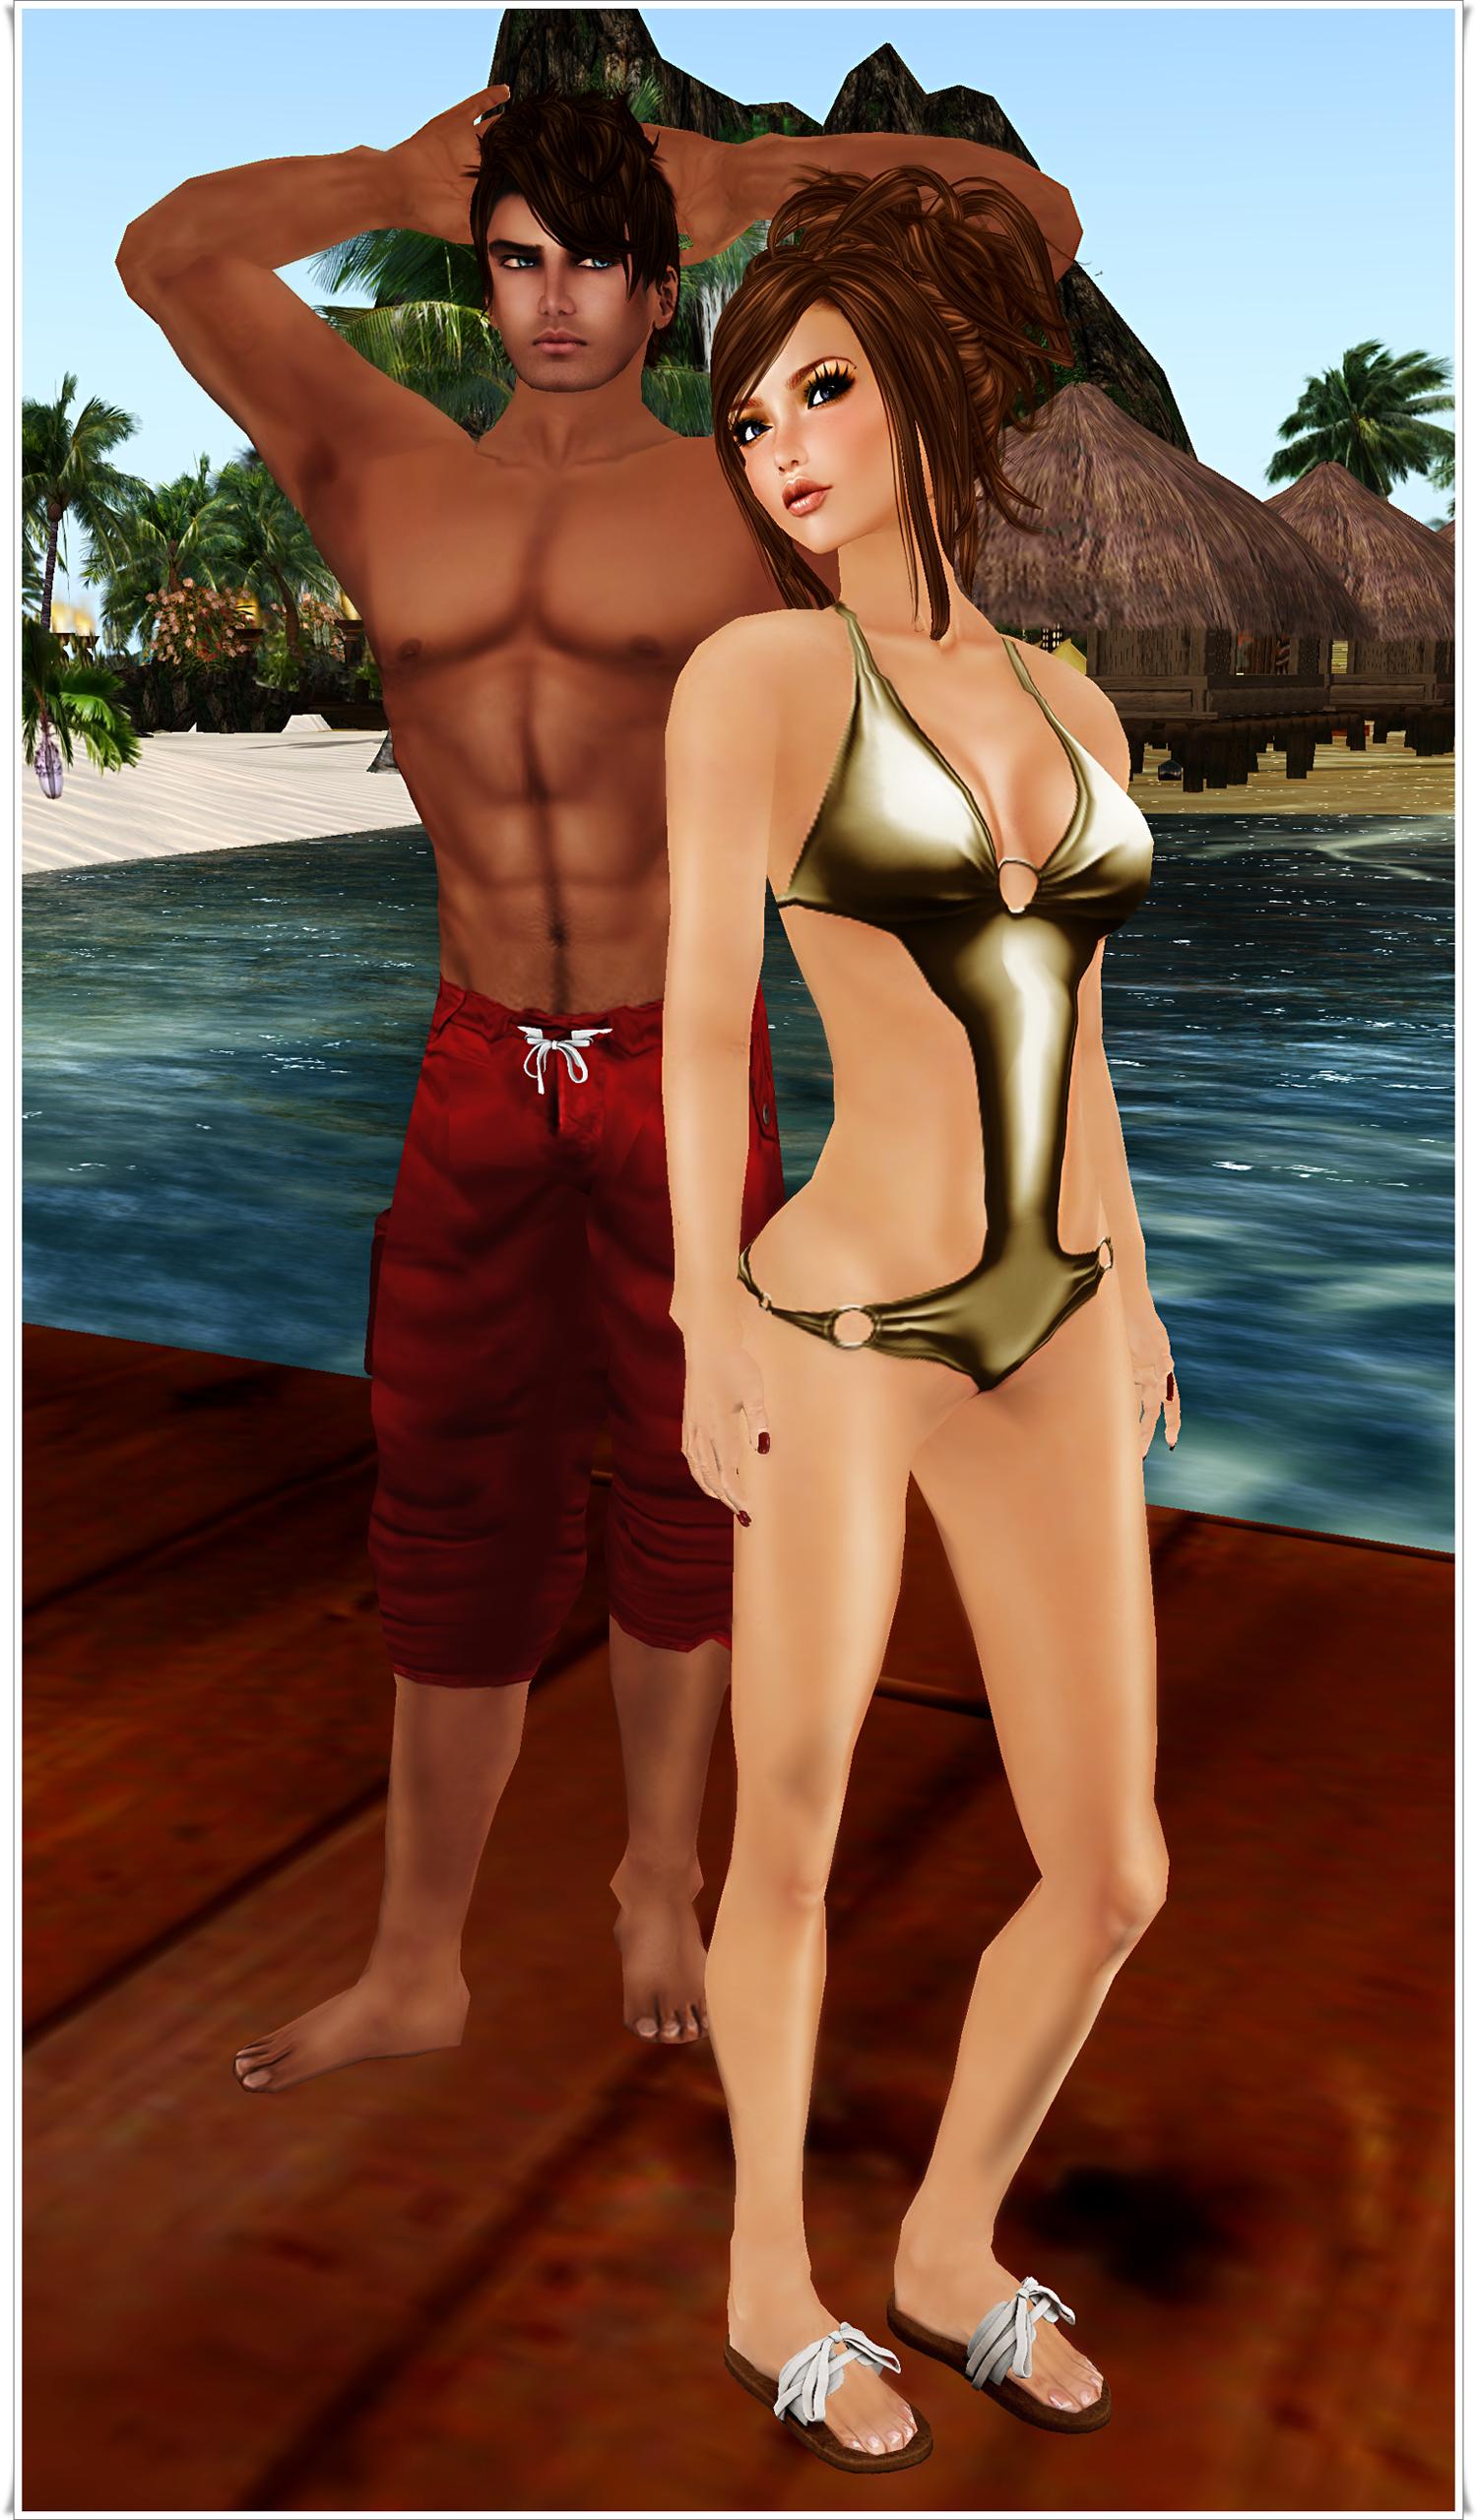 [VS] Free Bikinis